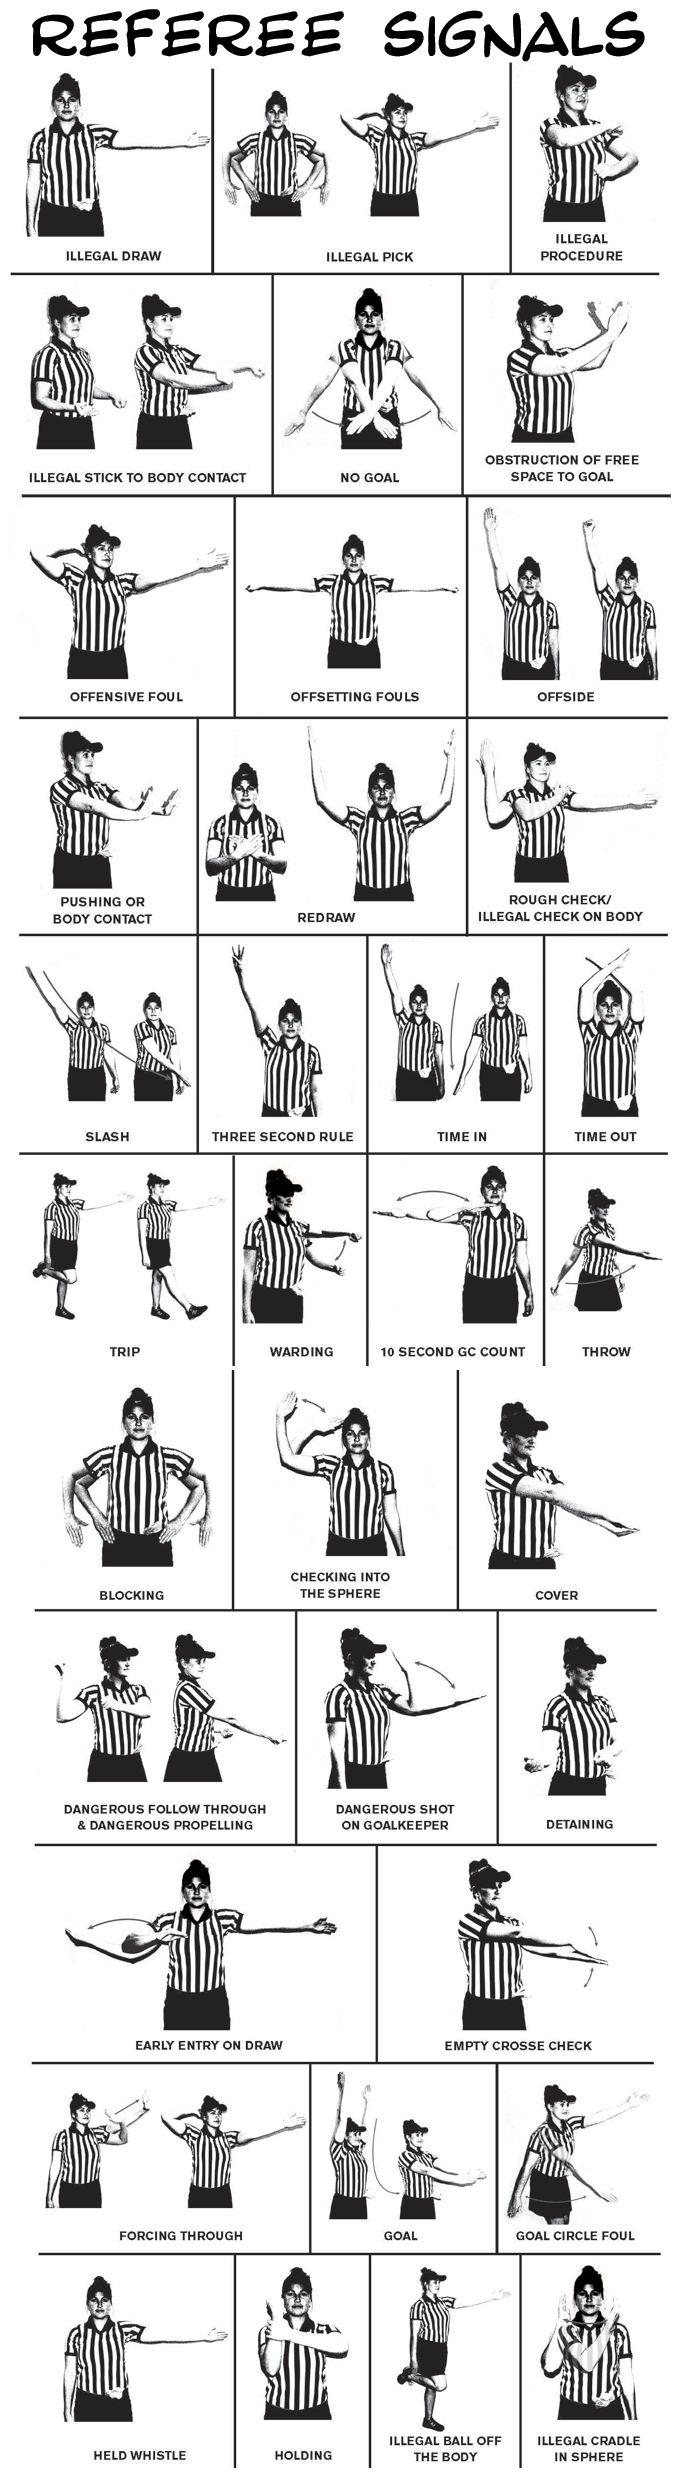 Womens/Girls Referee Signals